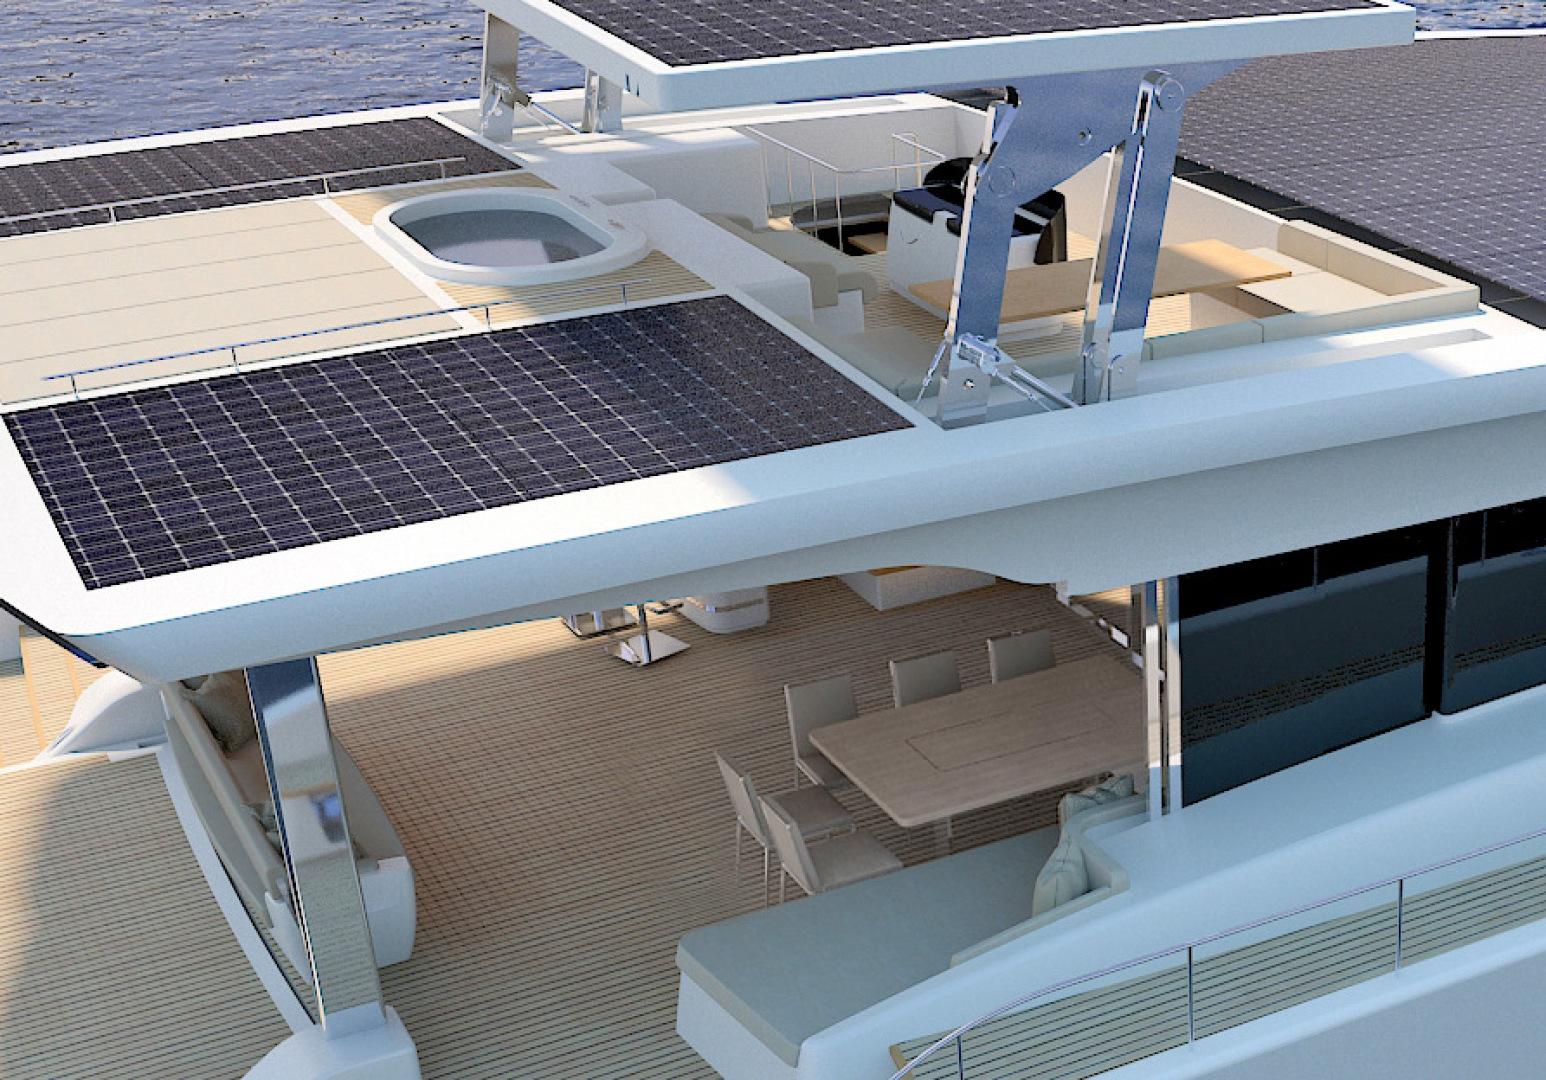 Silent-Yachts-Silent 80  2020-SILENT 80 Ancona-Italy-1262455 | Thumbnail